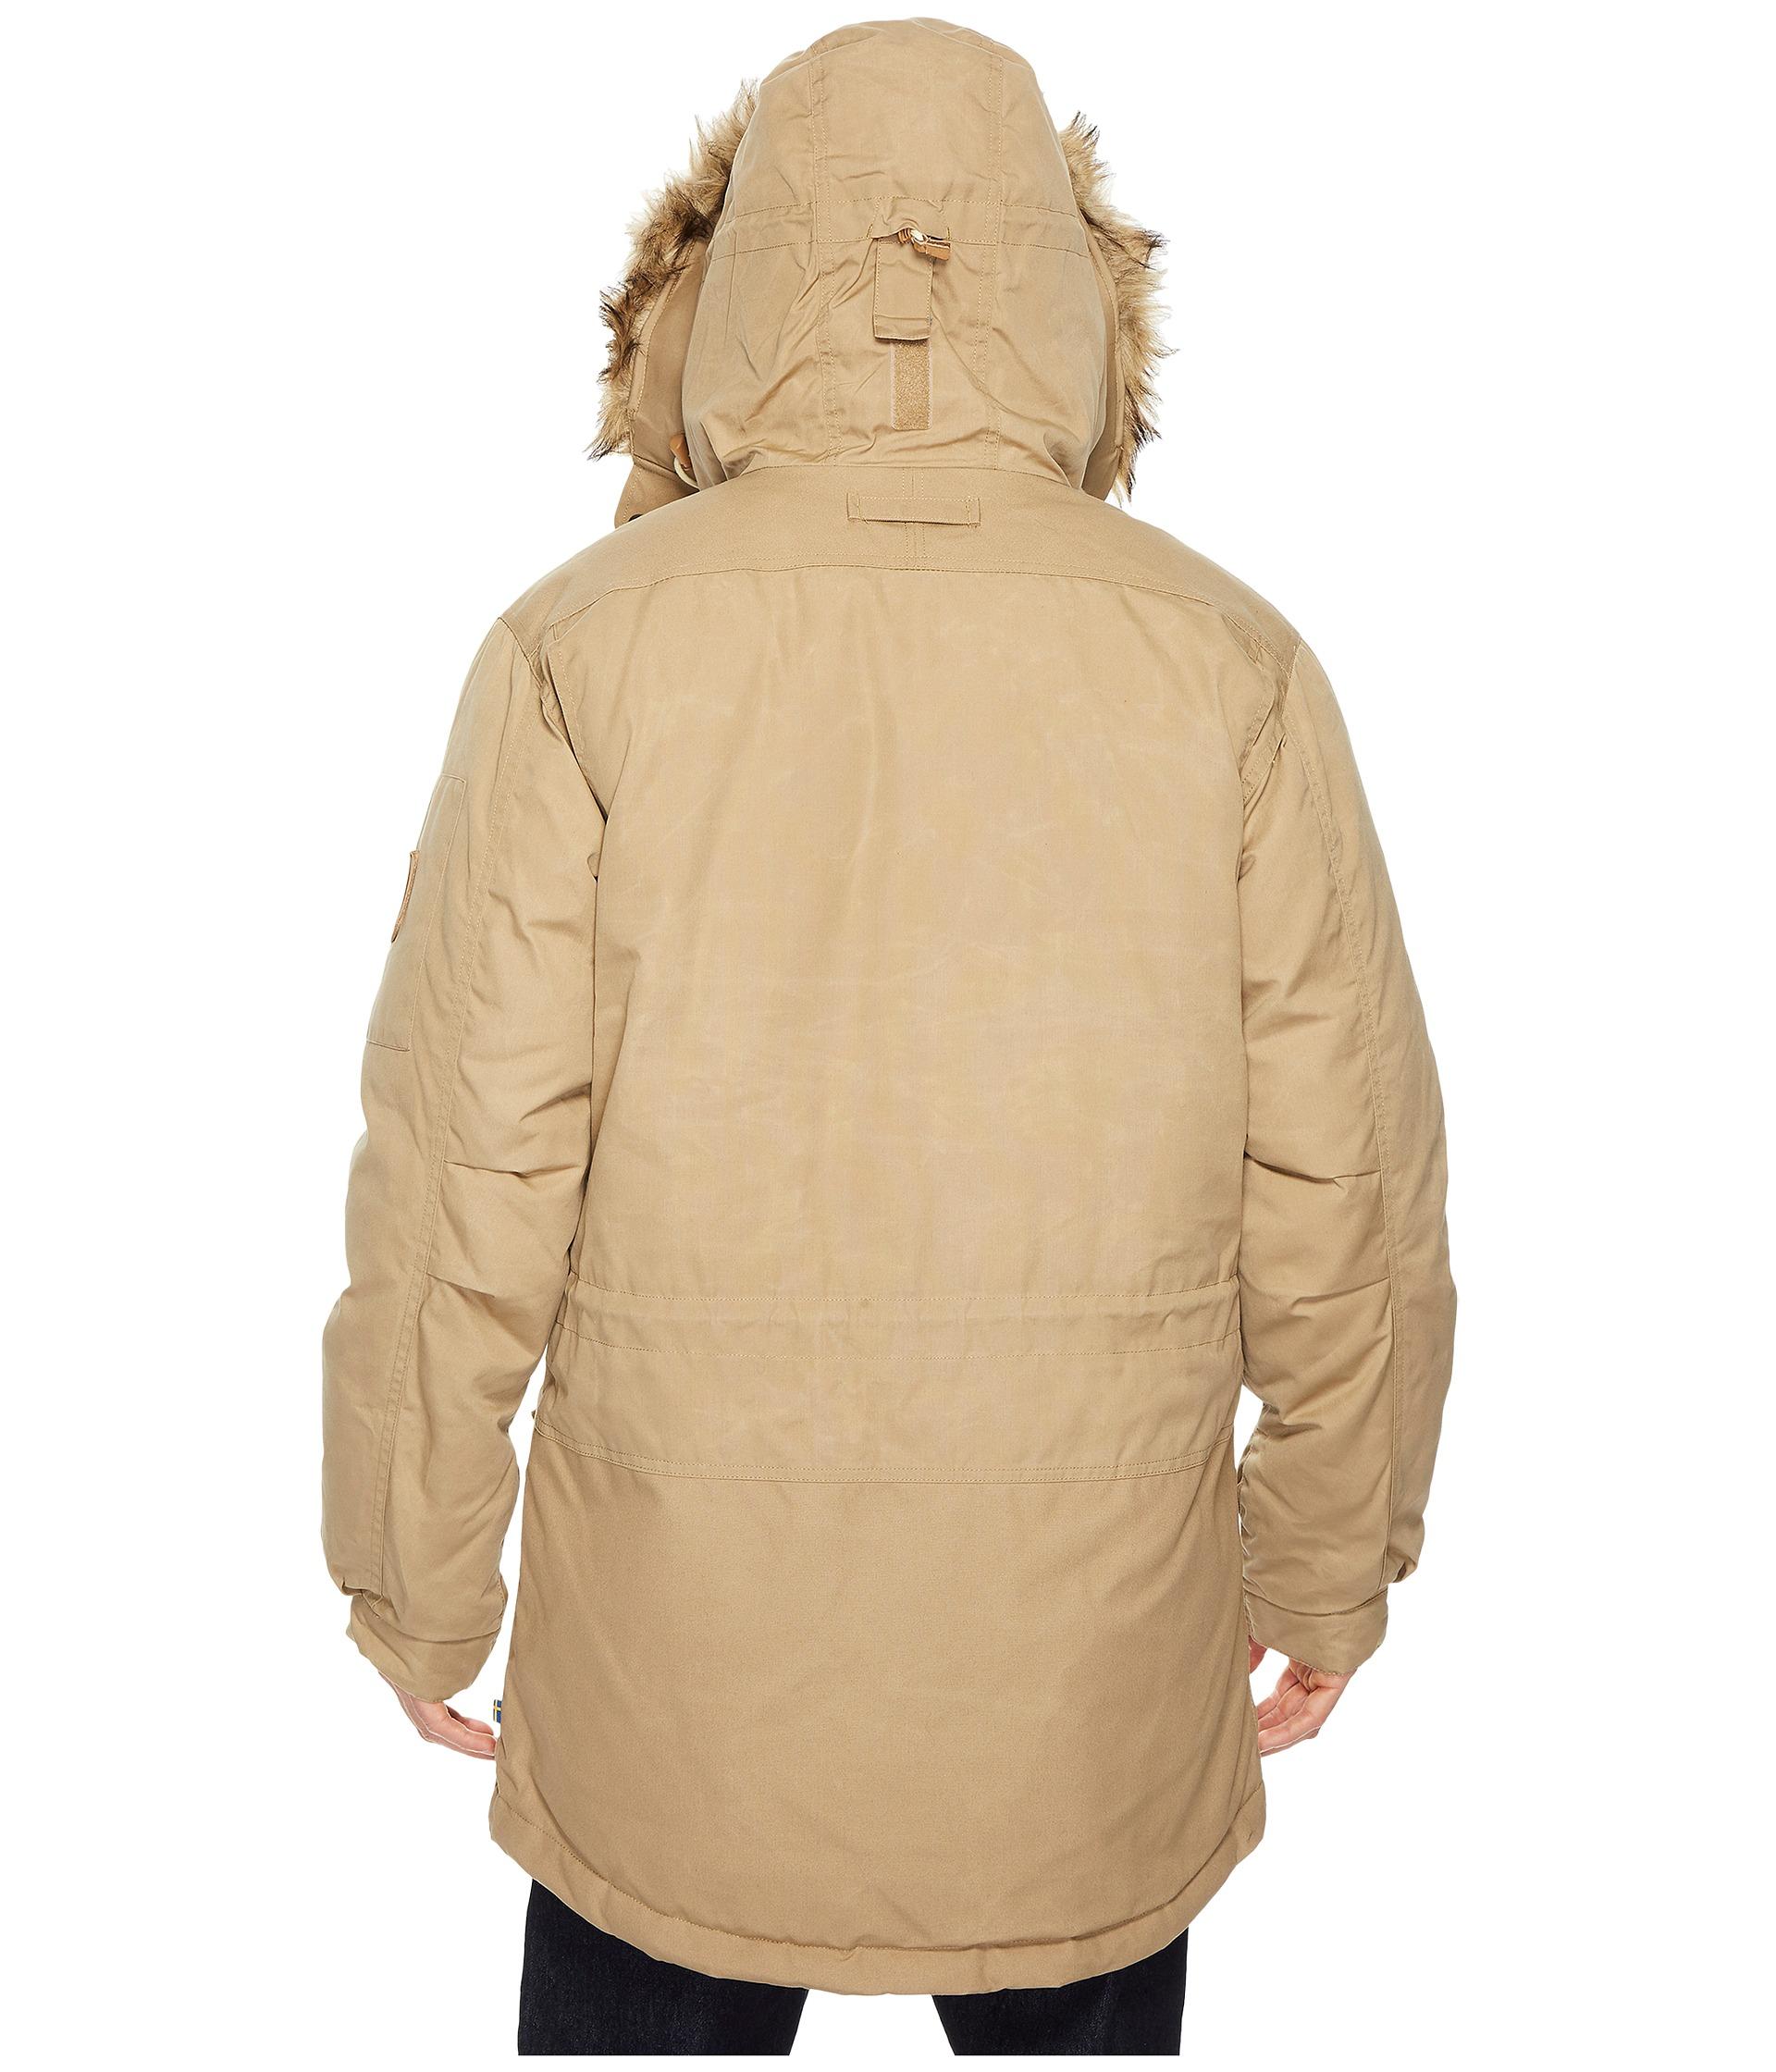 Fj 228 Llr 228 Ven Singi Down Jacket At Zappos Com